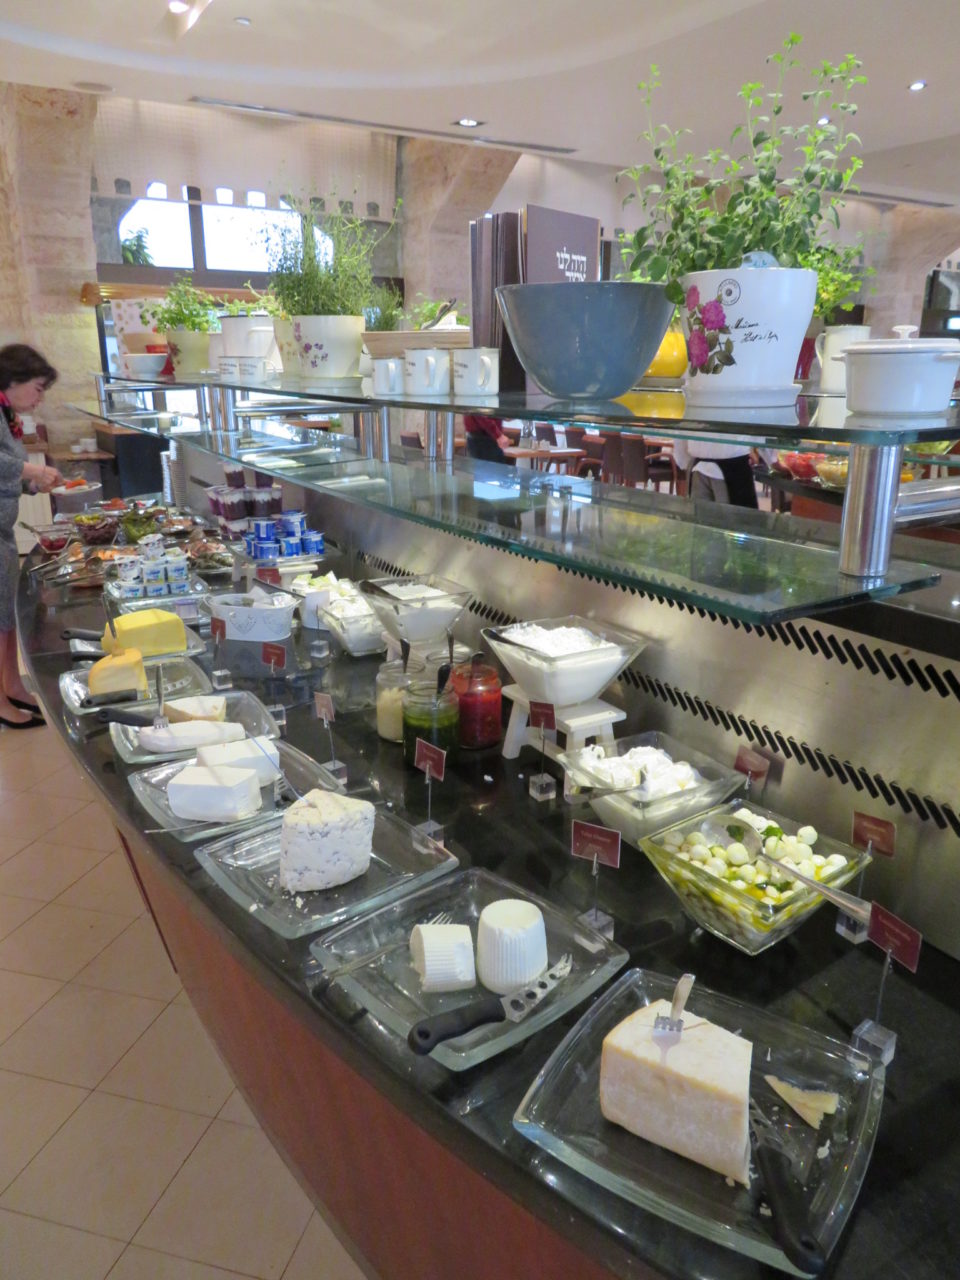 Israeli Breakfast : Artisanal Cheeses